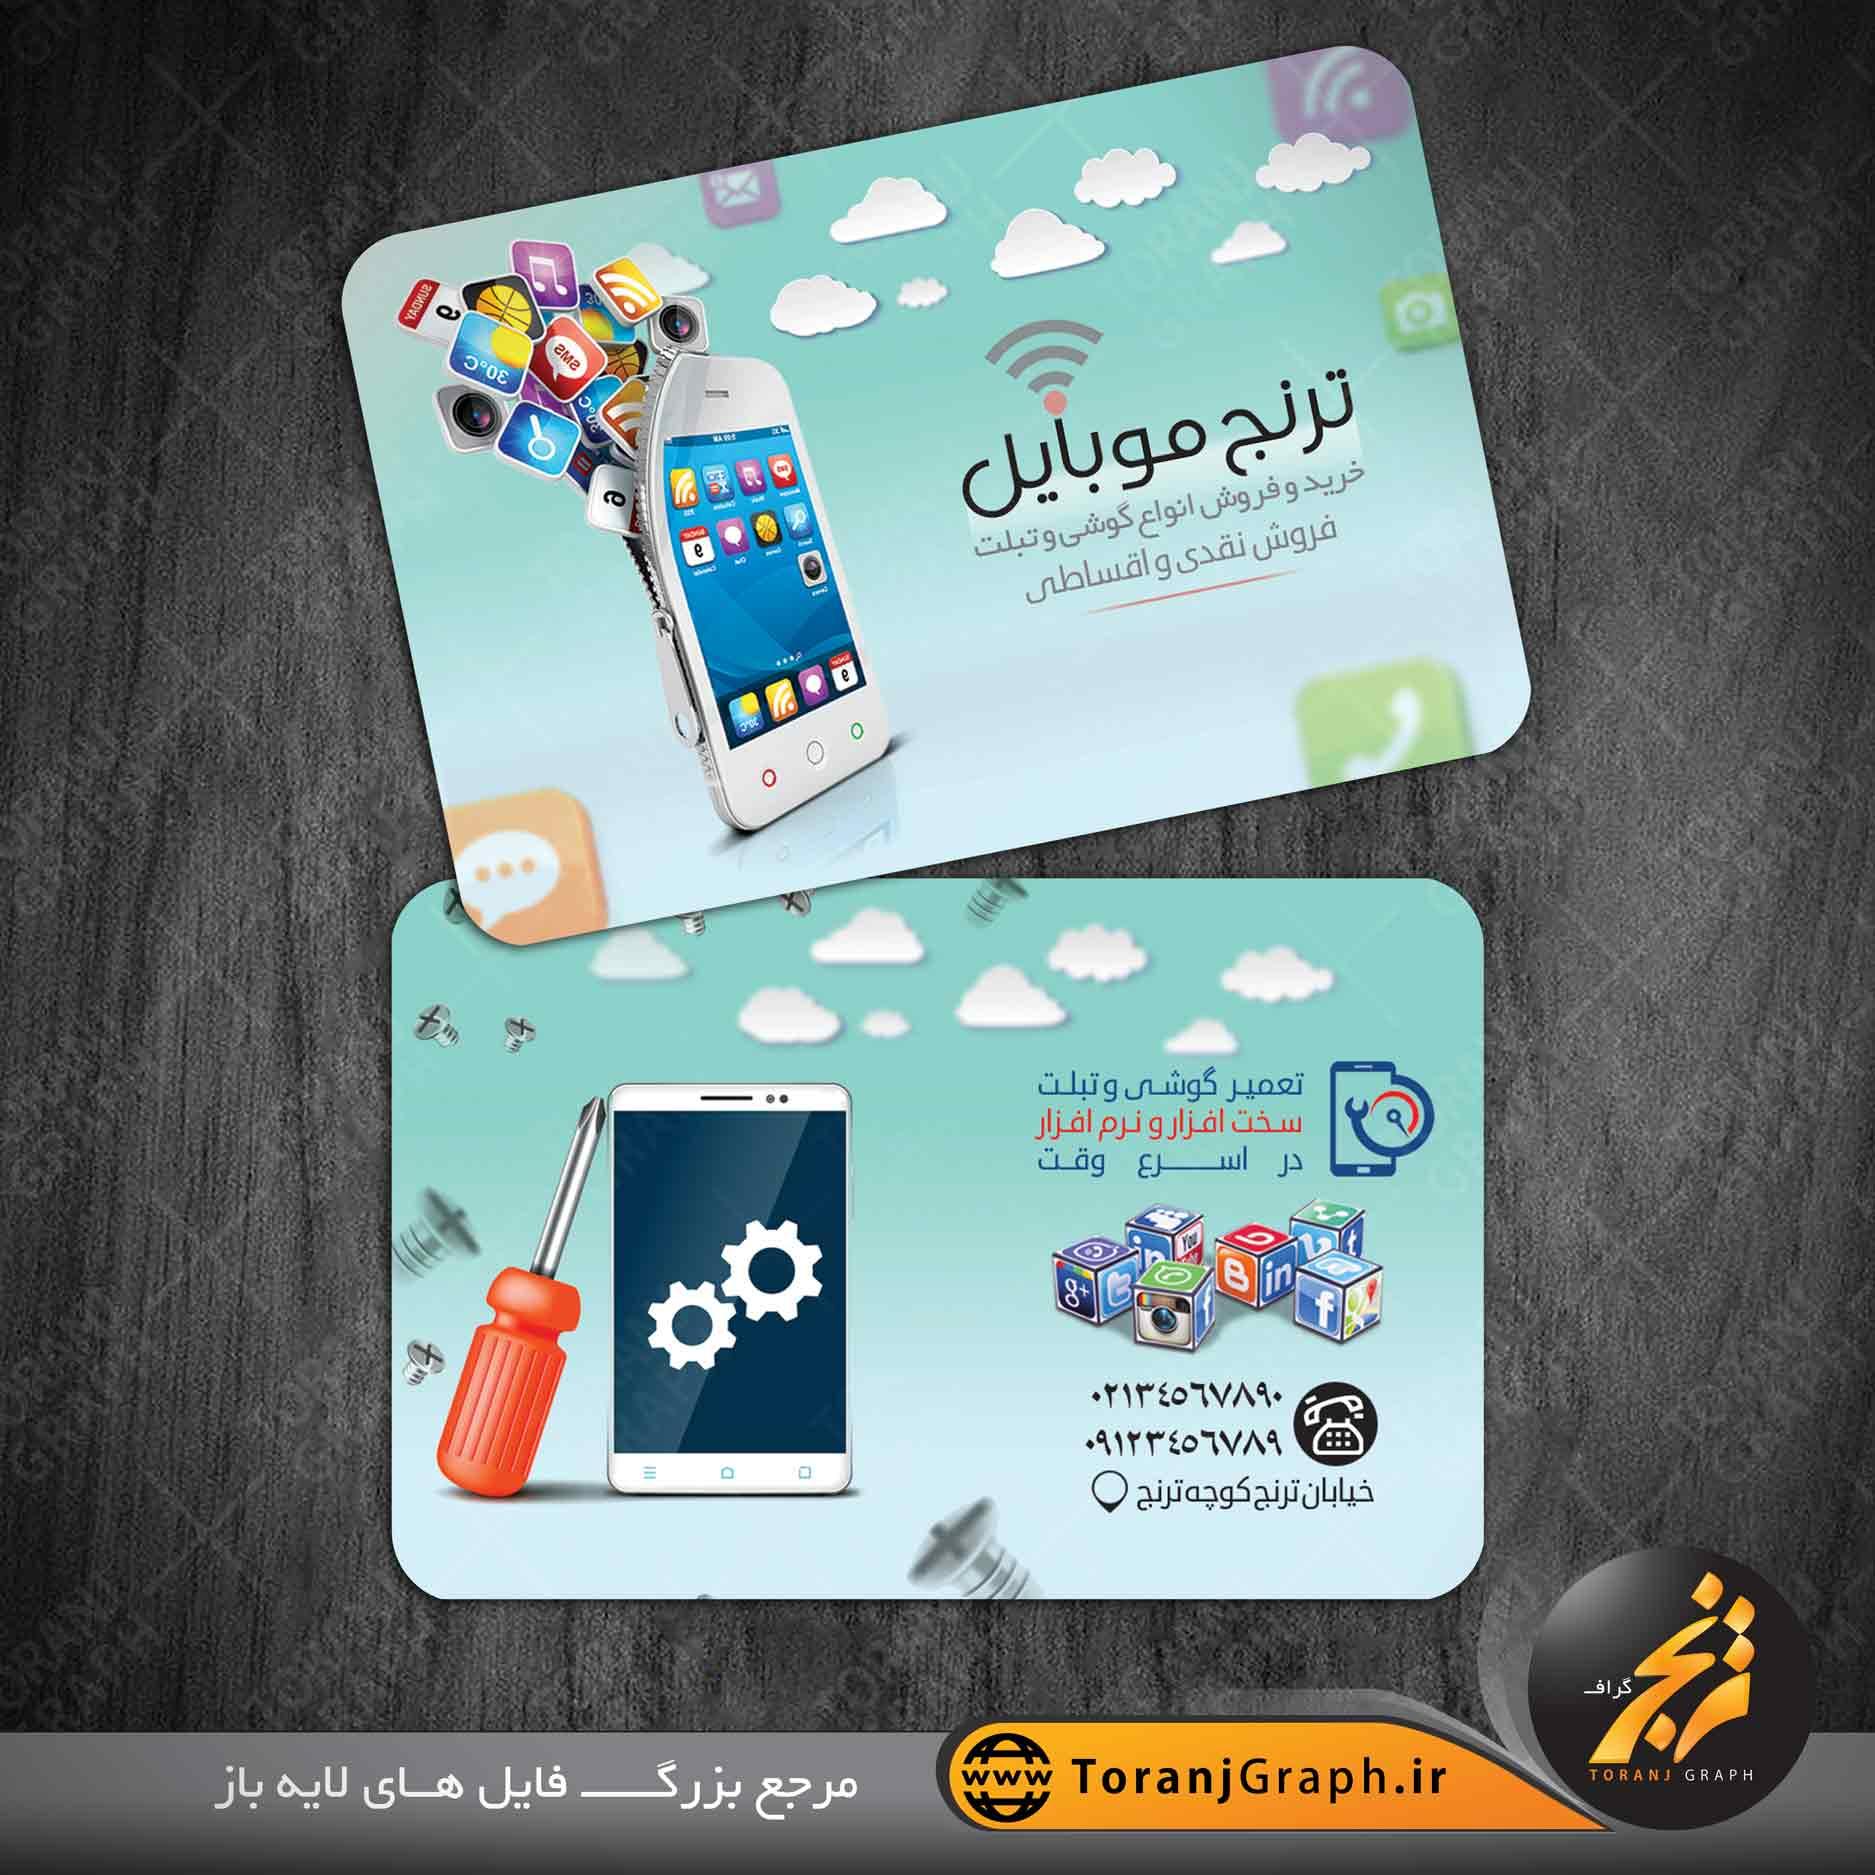 طرح psd کارت ویزیت موبایل فروشی